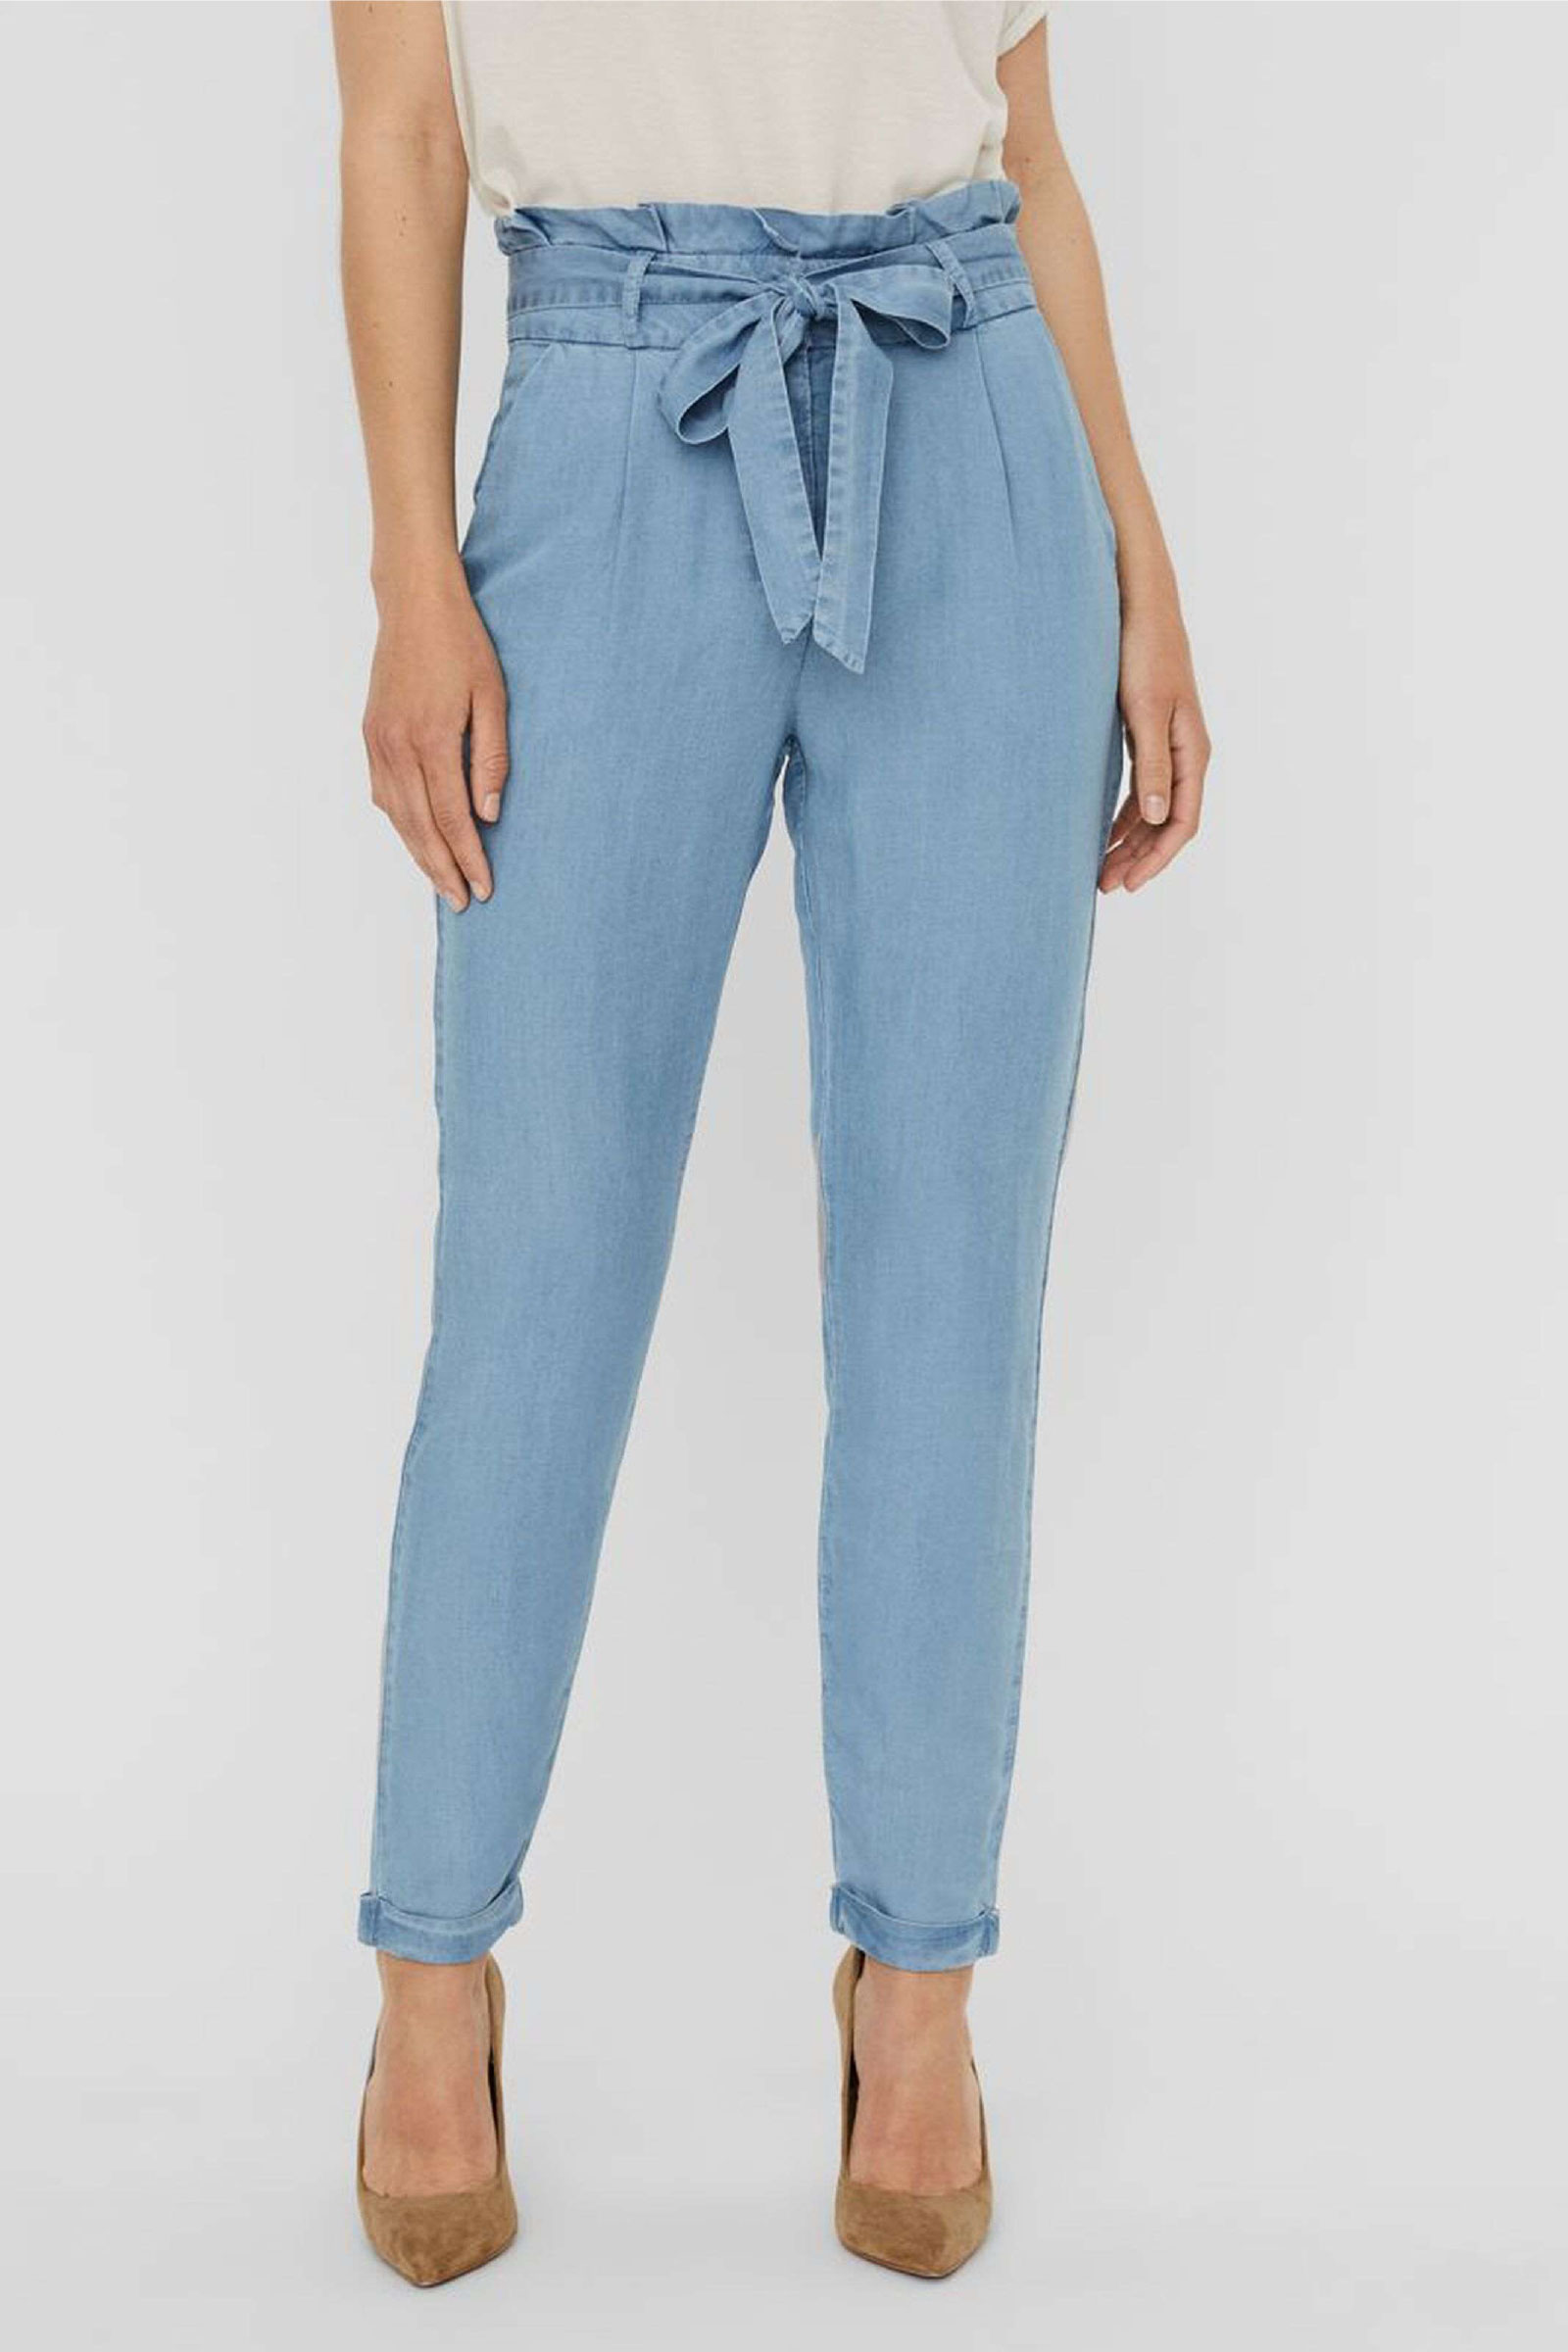 VERO MODA PANTALONE Donna Modello VIVIANAEVA VERO MODA | Pantalone | 10242257Light Blue Denim